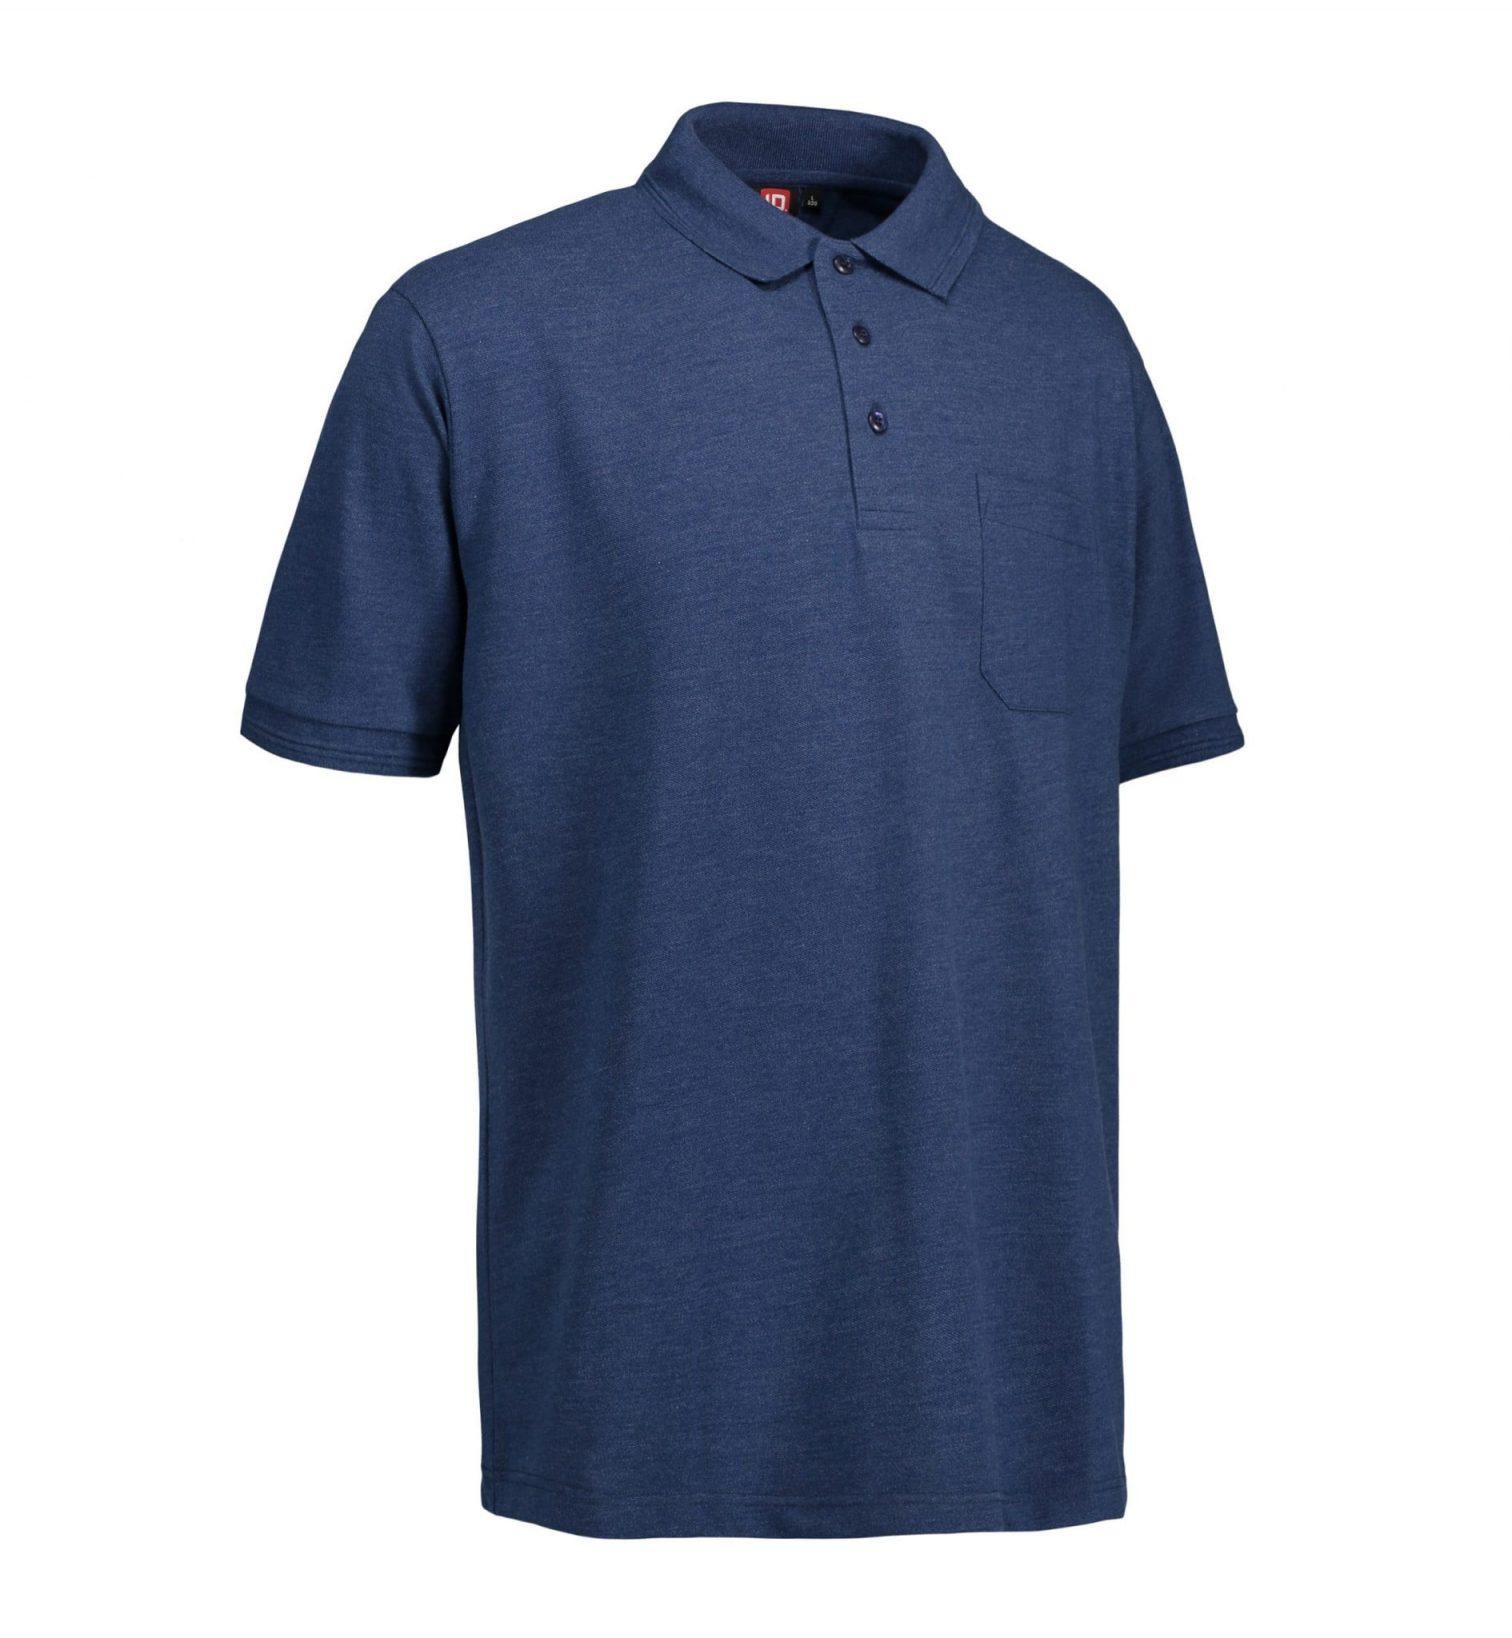 ID PRO Wear slidstærk poloshirt m. lomme herre blå melange